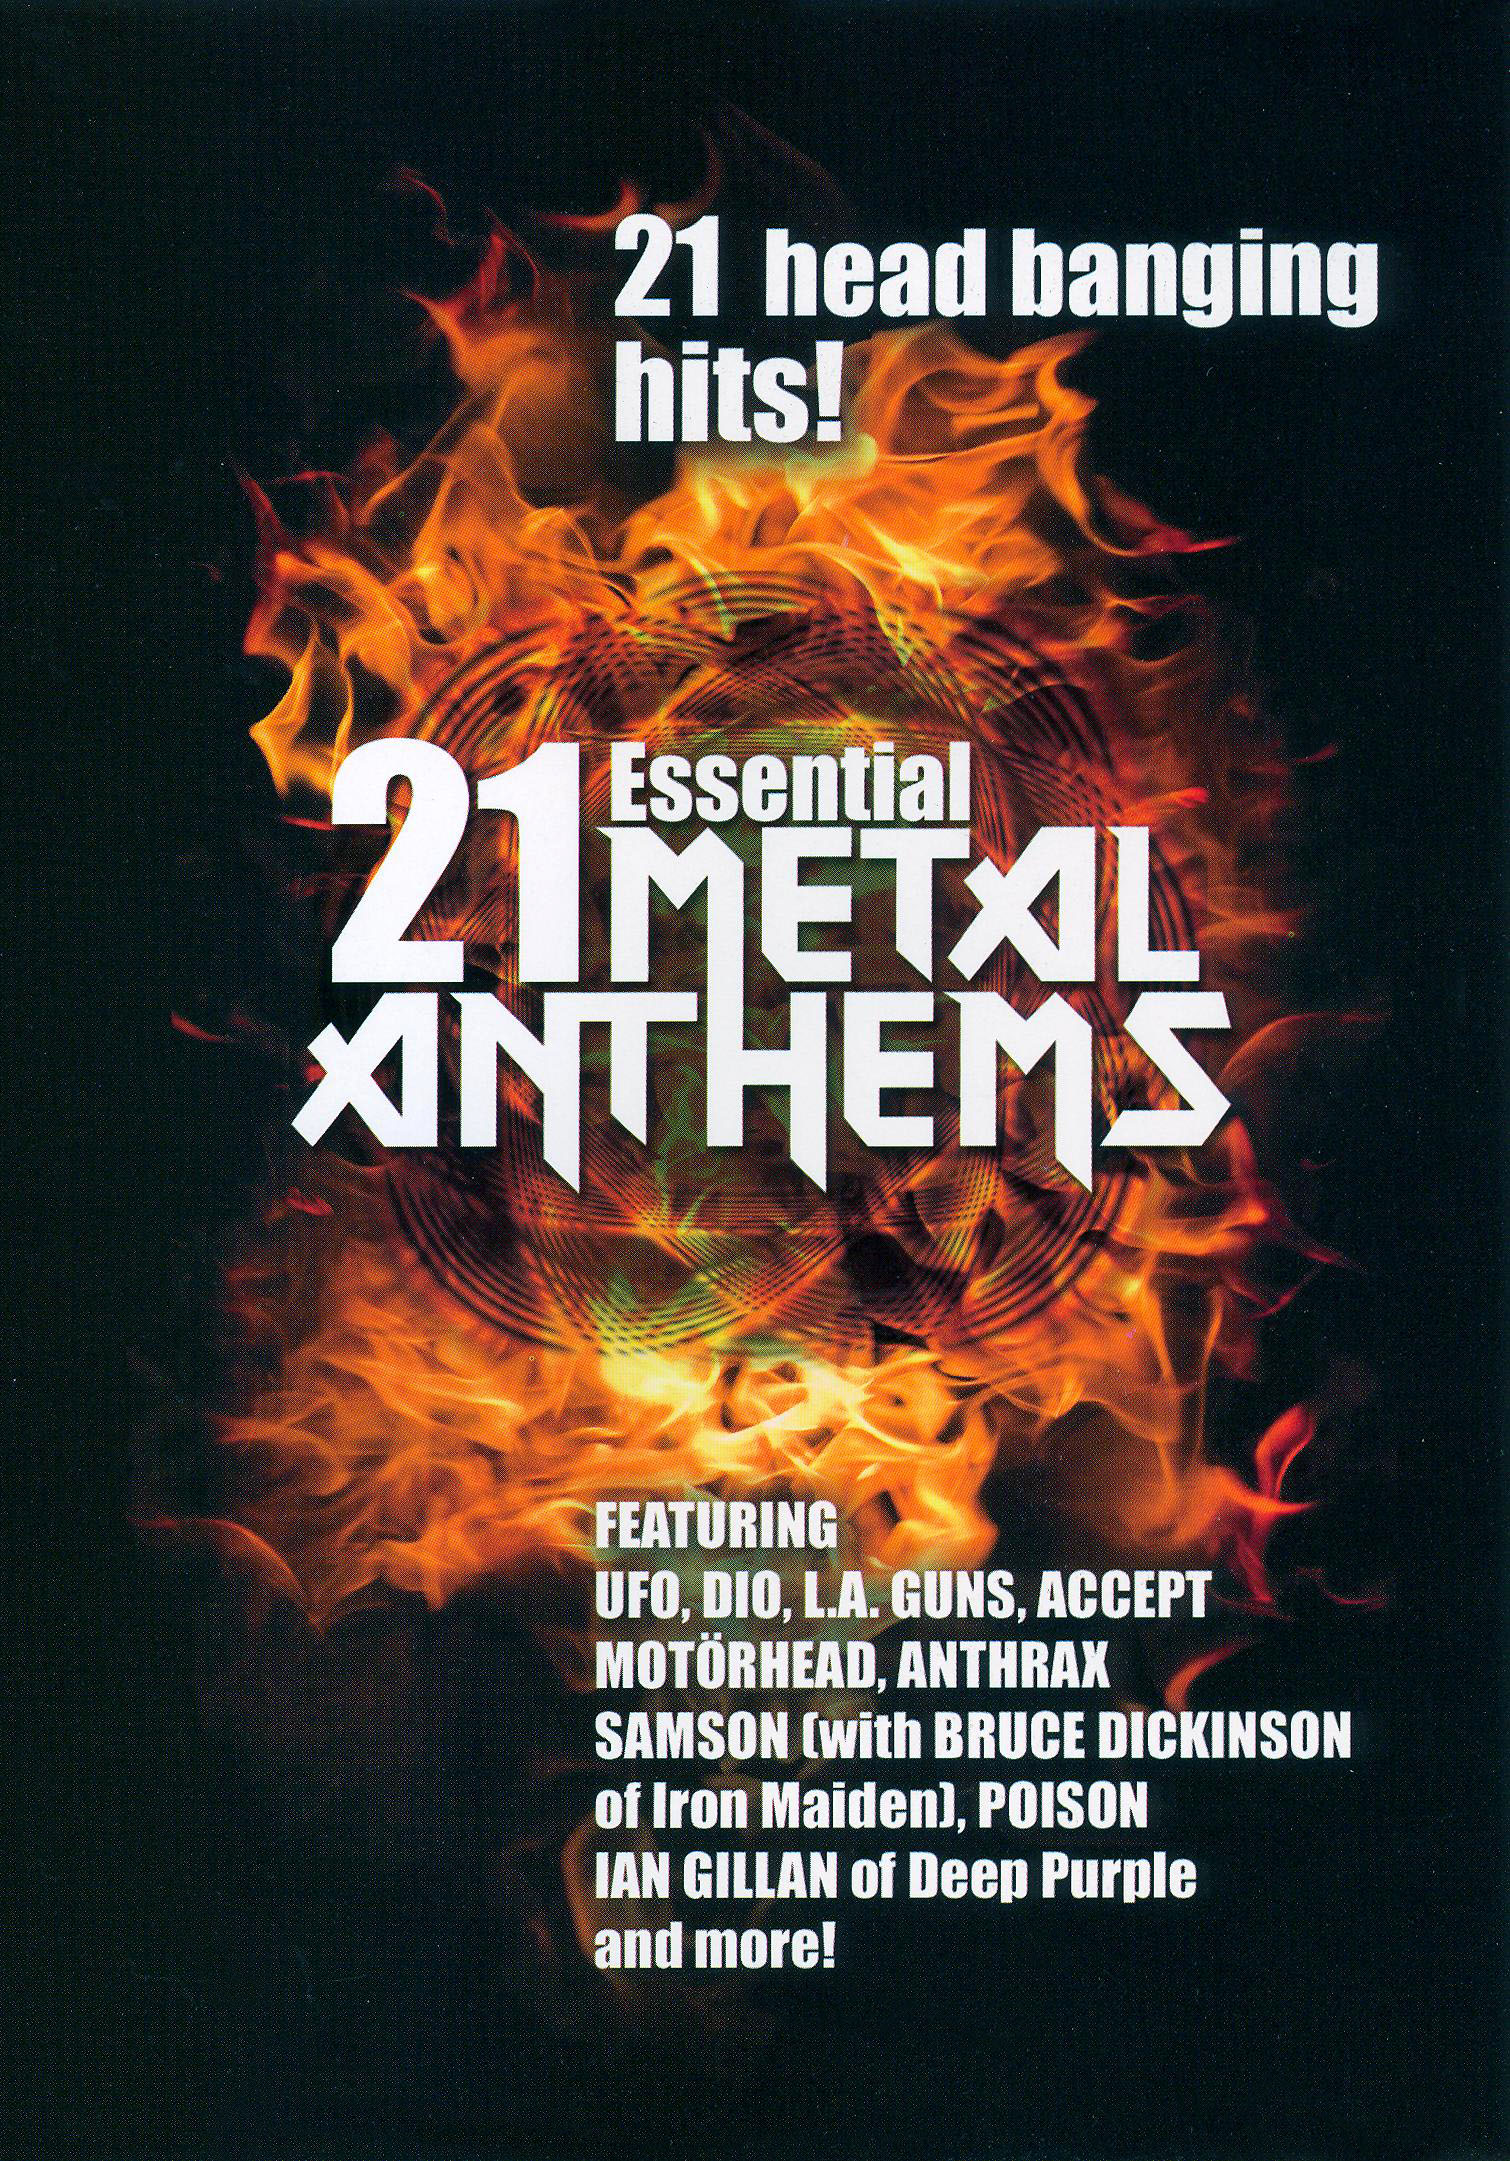 21 Essential Metal Anthems